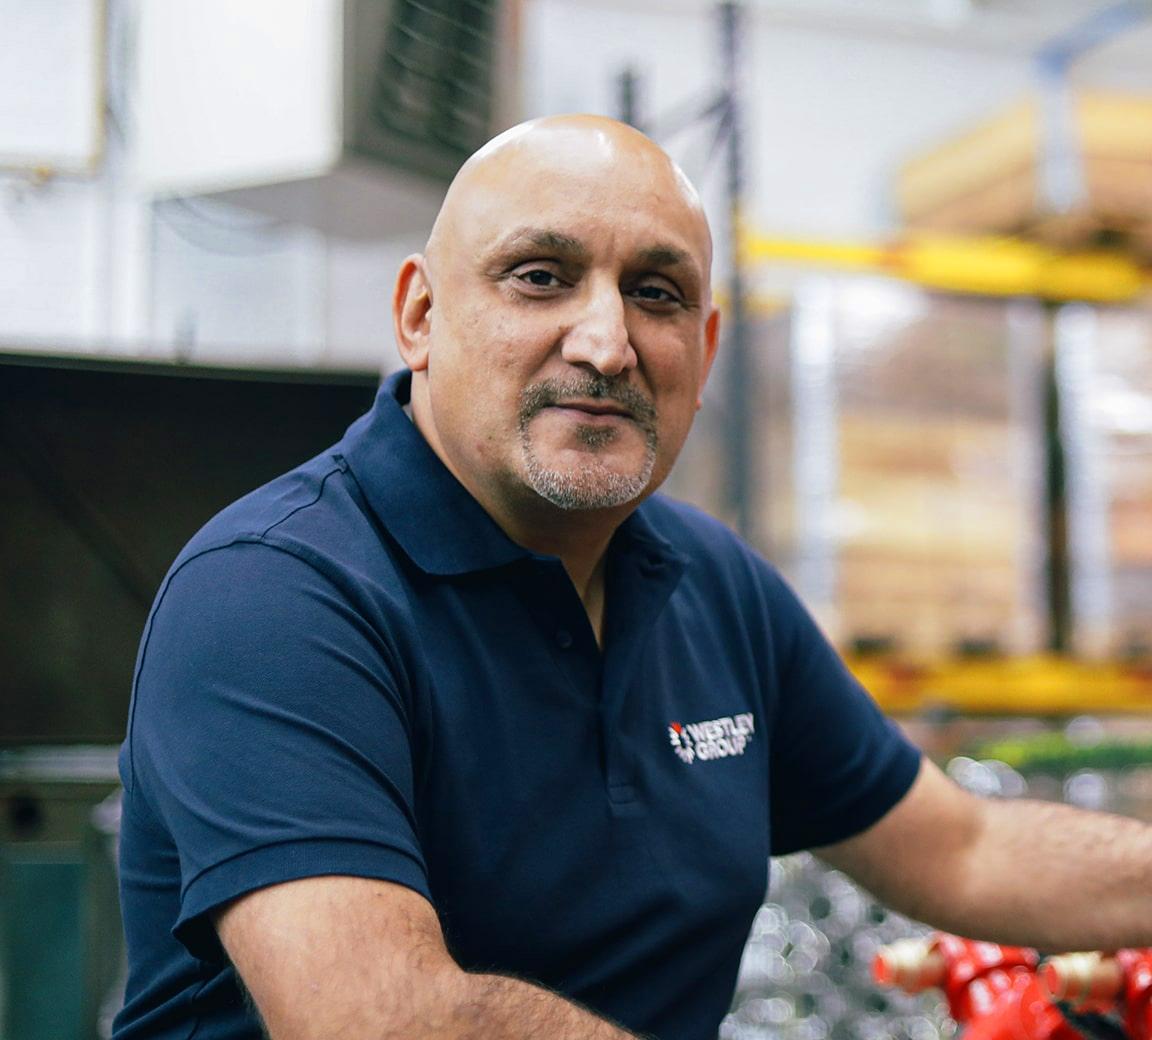 Tariq-Suleman-resize-min